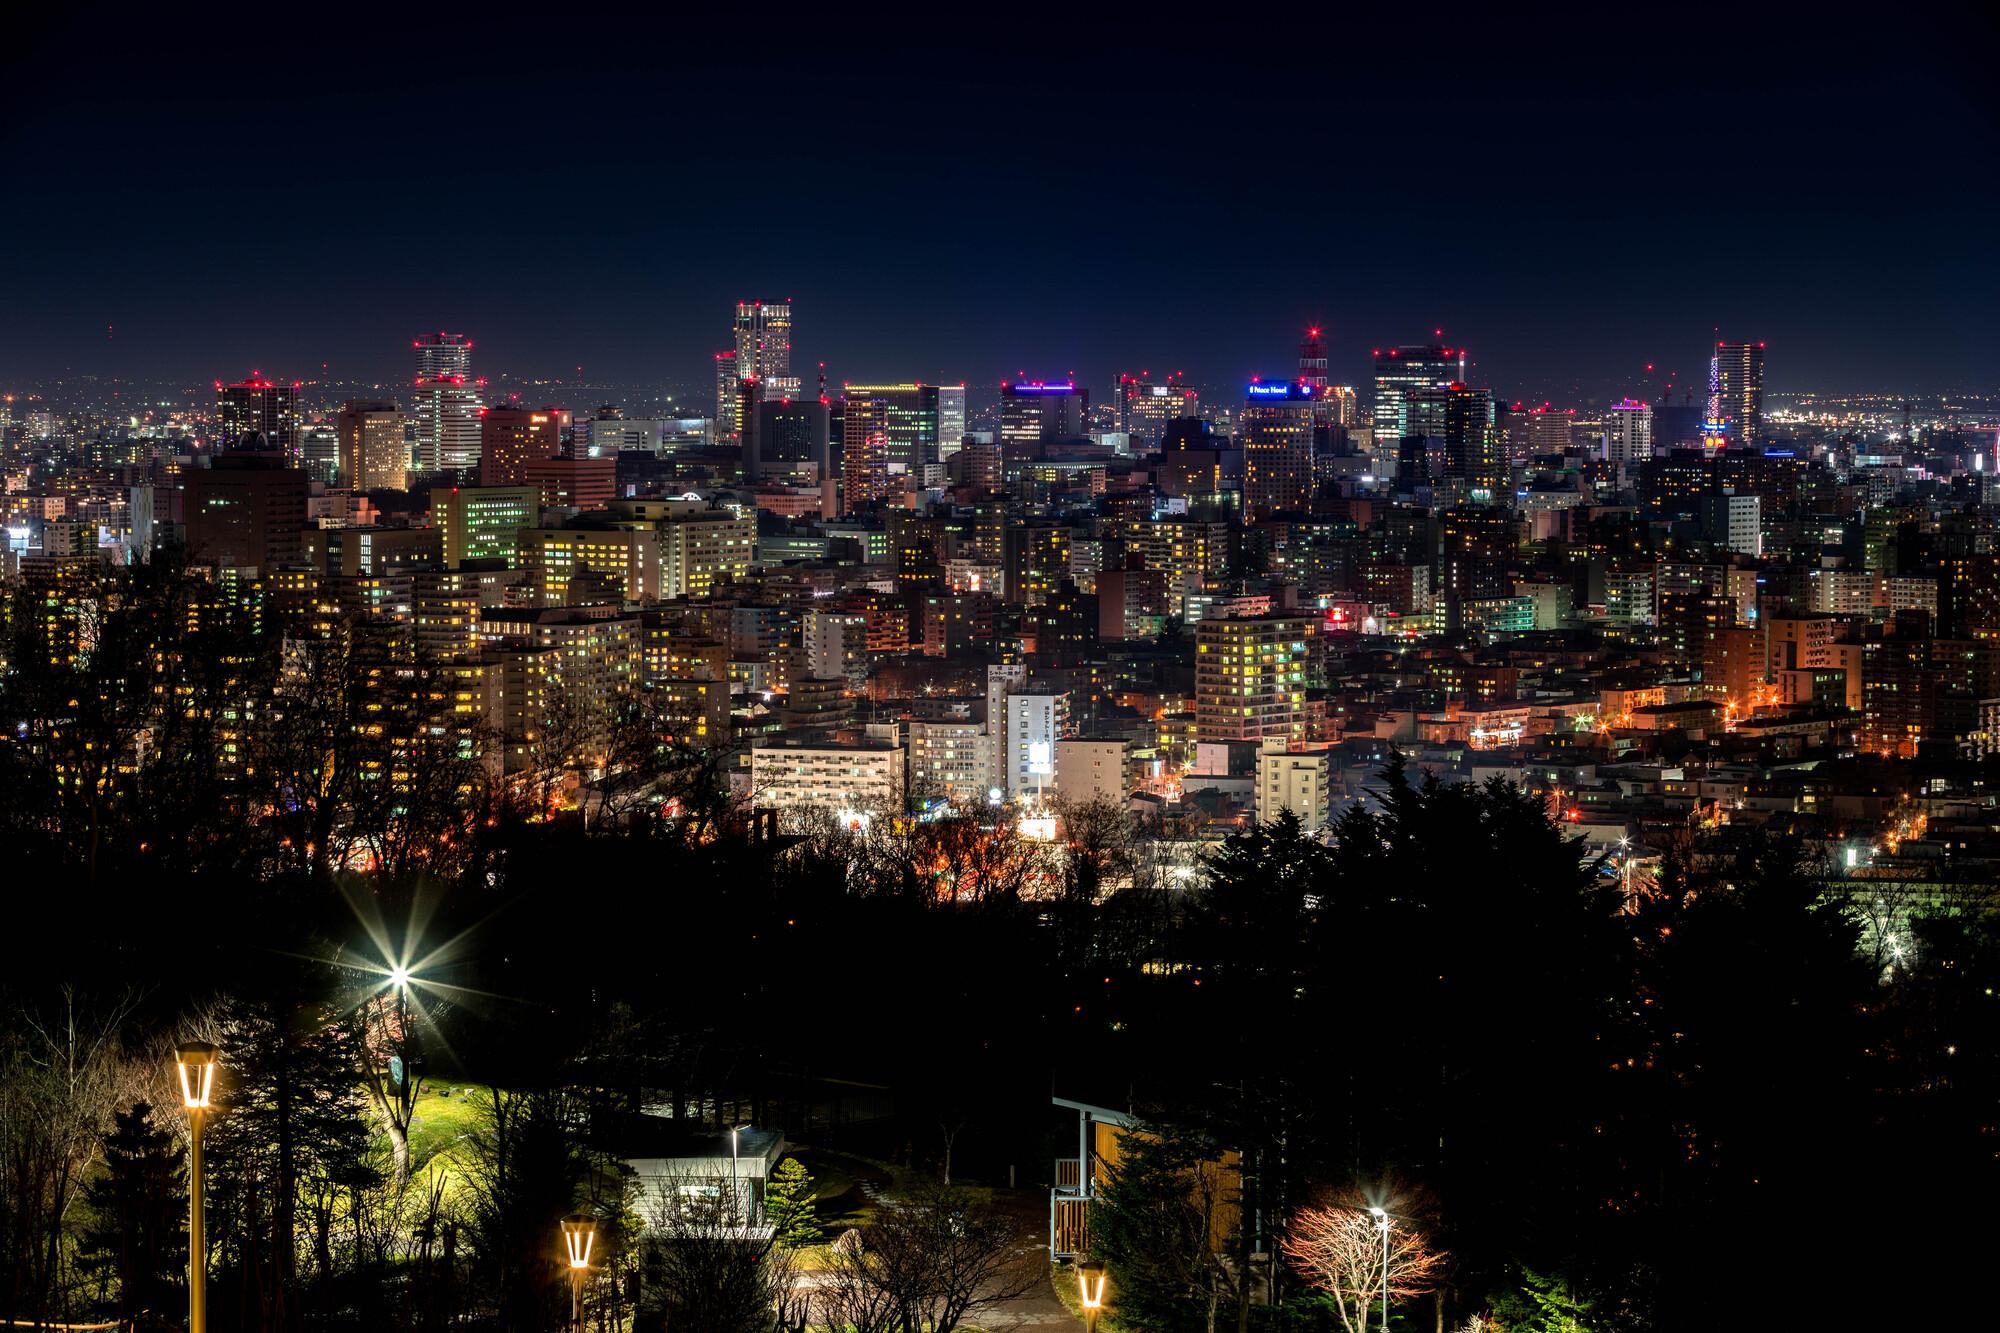 札幌・旭山記念公園の夜景